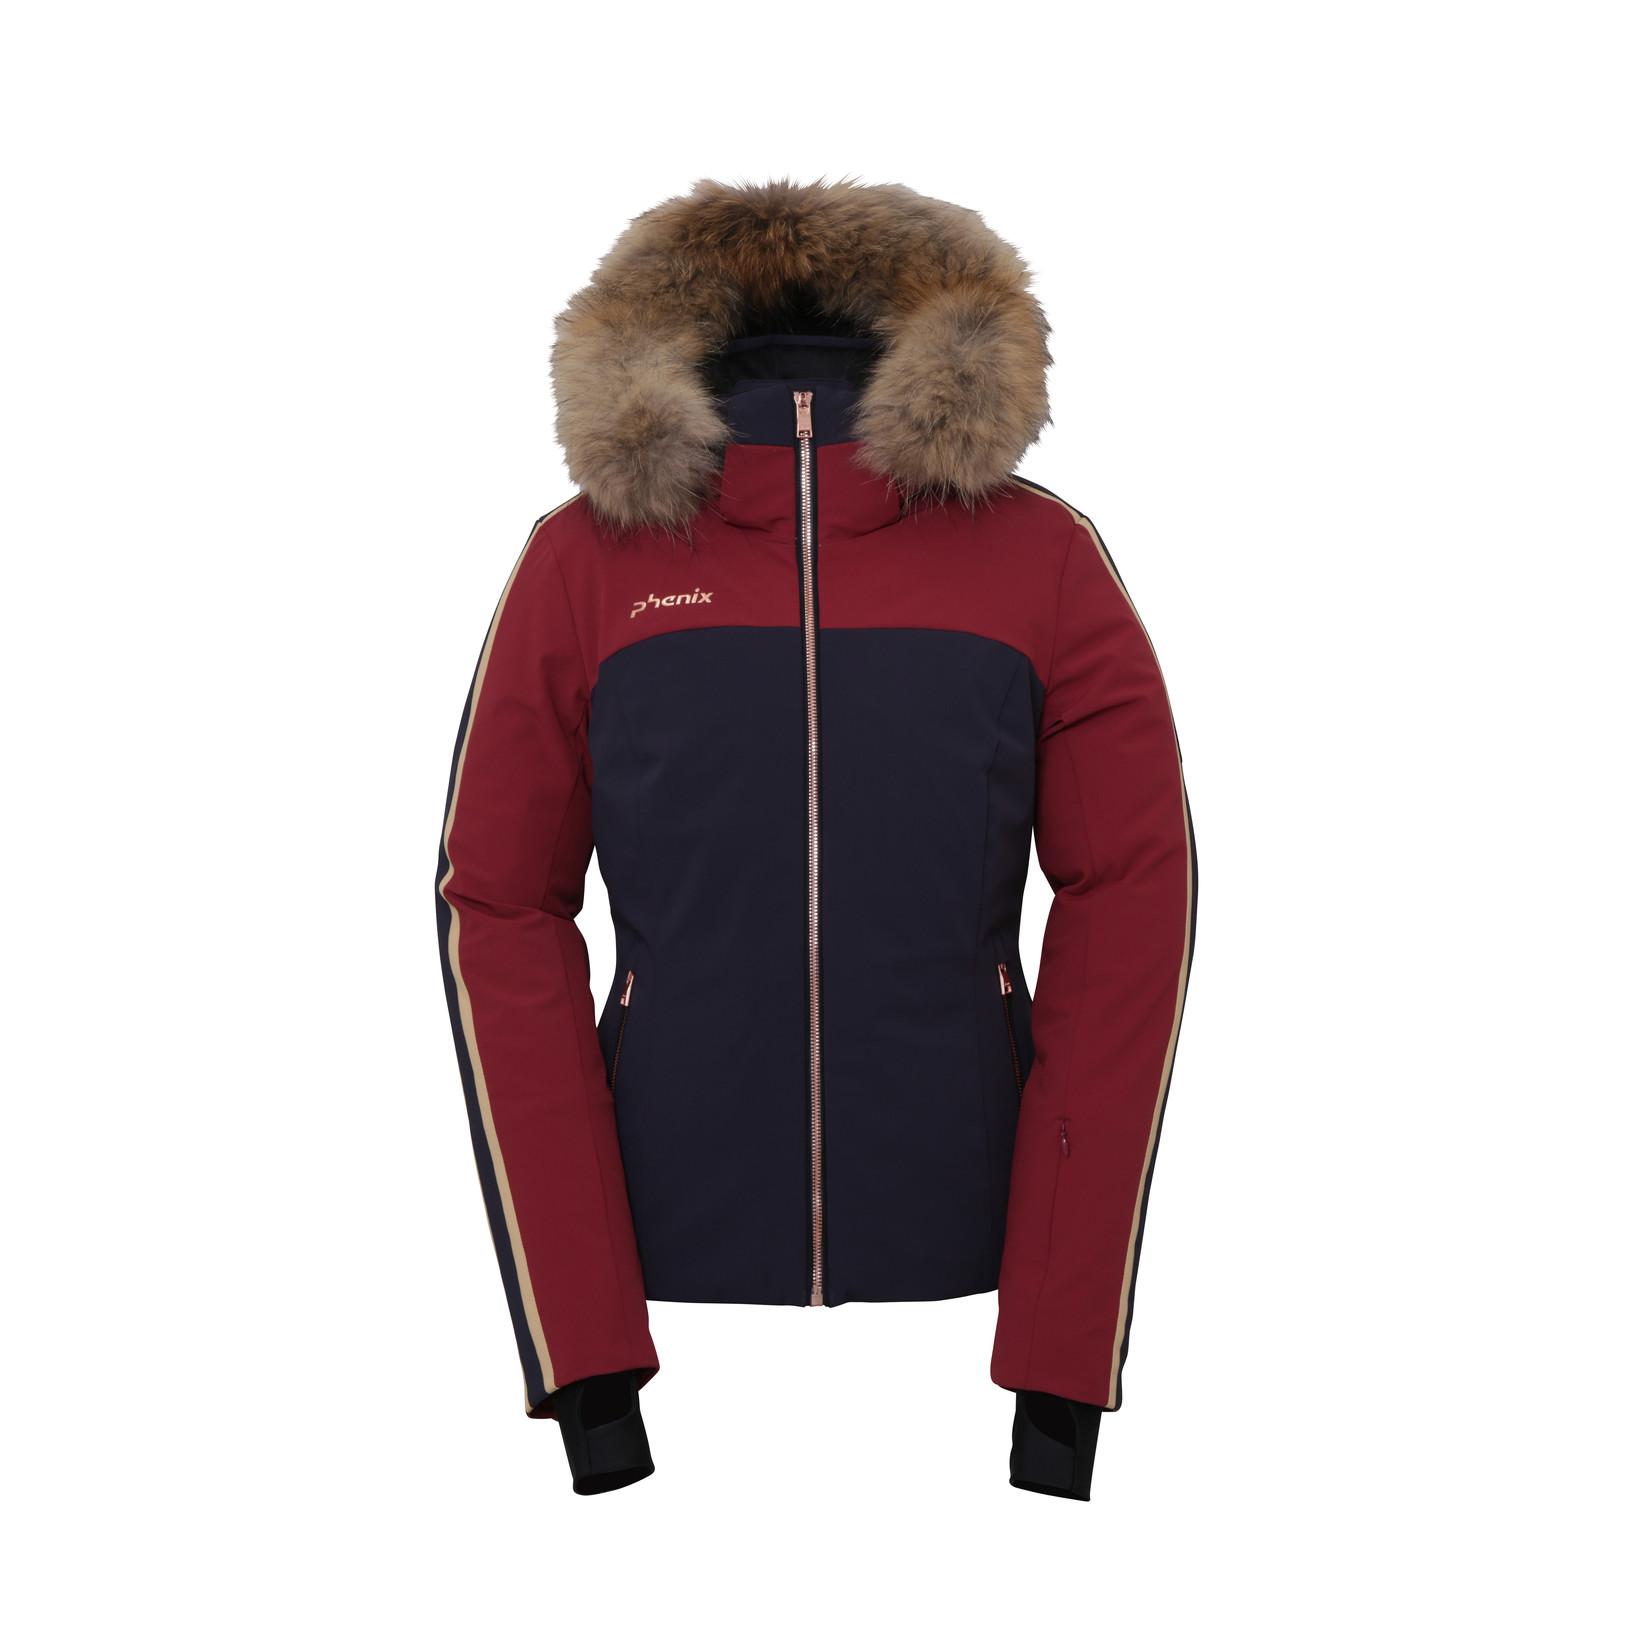 PHENIX Sapphire Hybrid Down Jacket with Fur